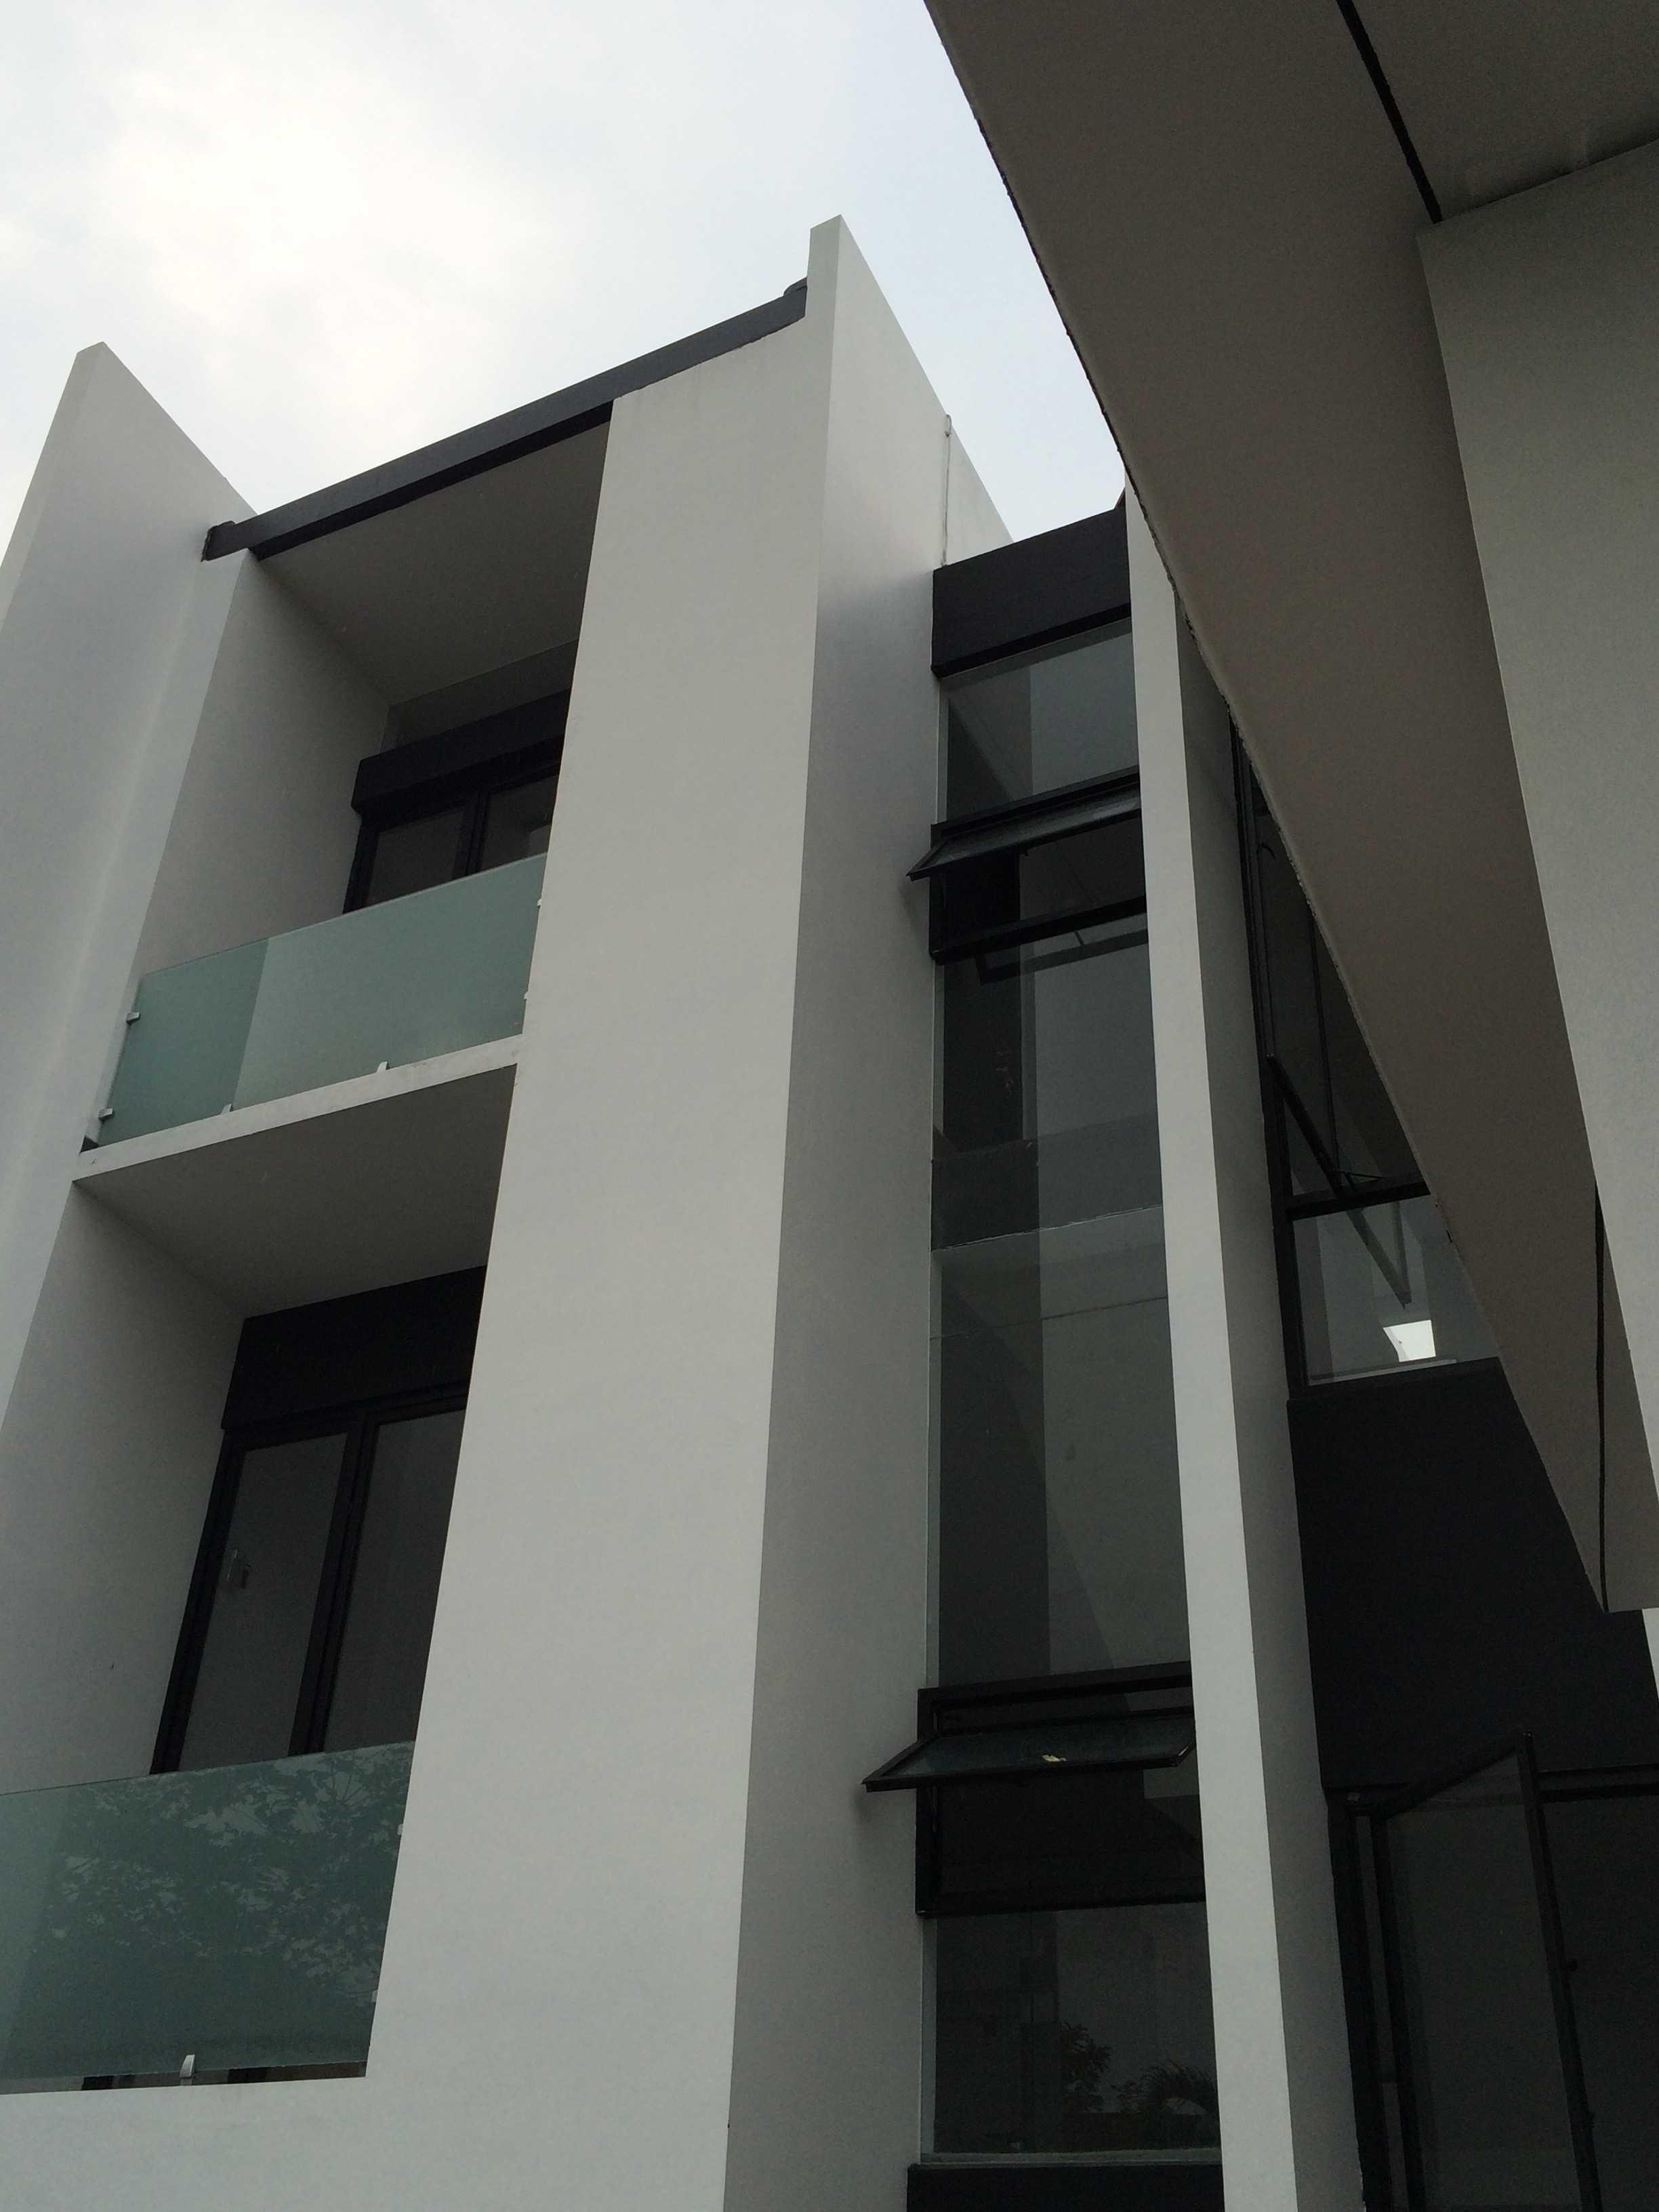 Jerry M. Febrino Rs House Jl. Pesona Paris, Ciangsana, Gn. Putri, Bogor, Jawa Barat 16968, Indonesia Kota Wisata Img9508 Modern  14919